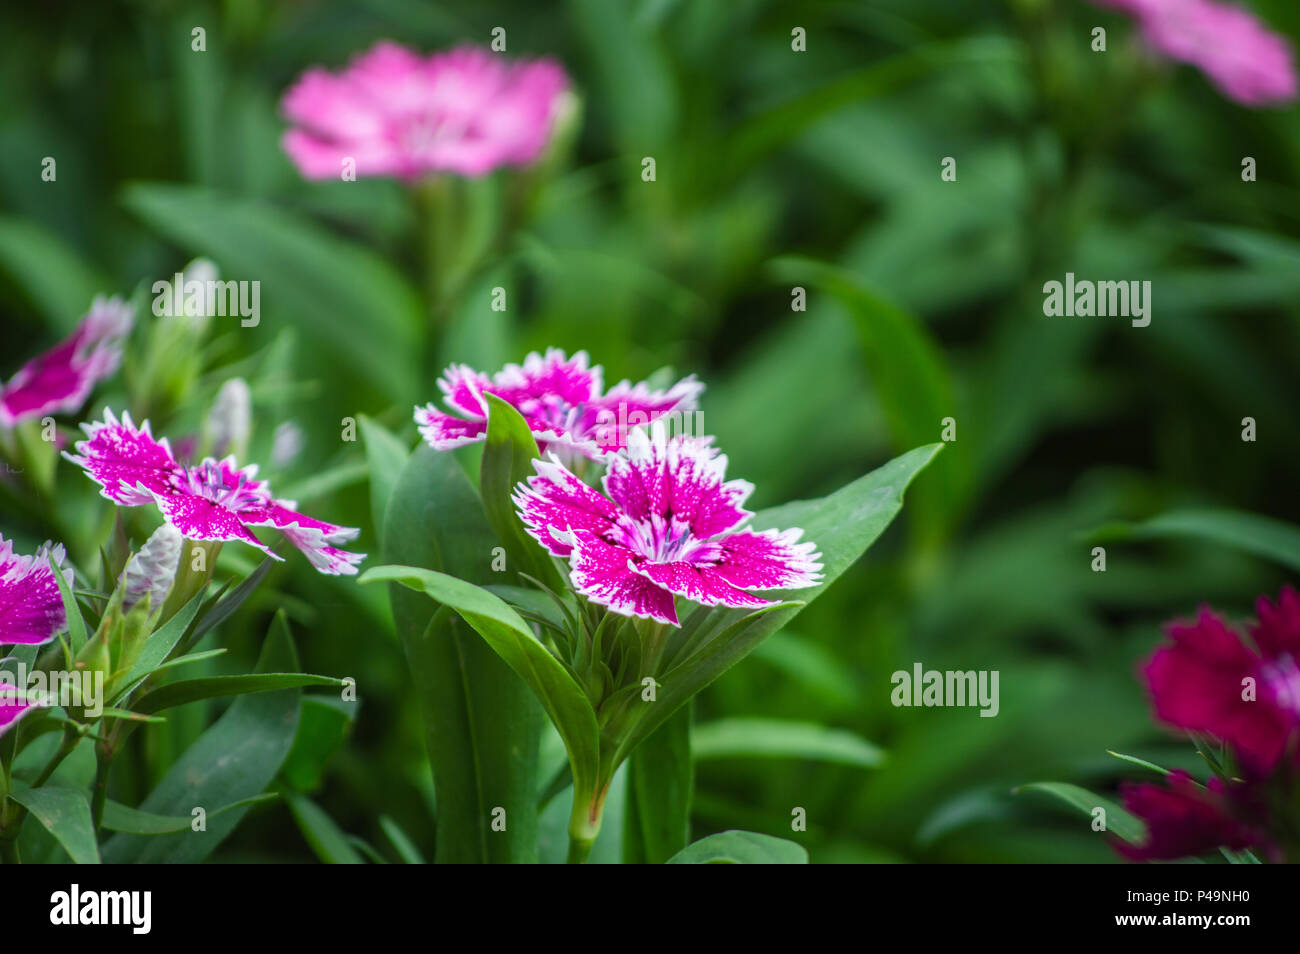 Dianthus flower (sweet william) blooms in the garden - Stock Image